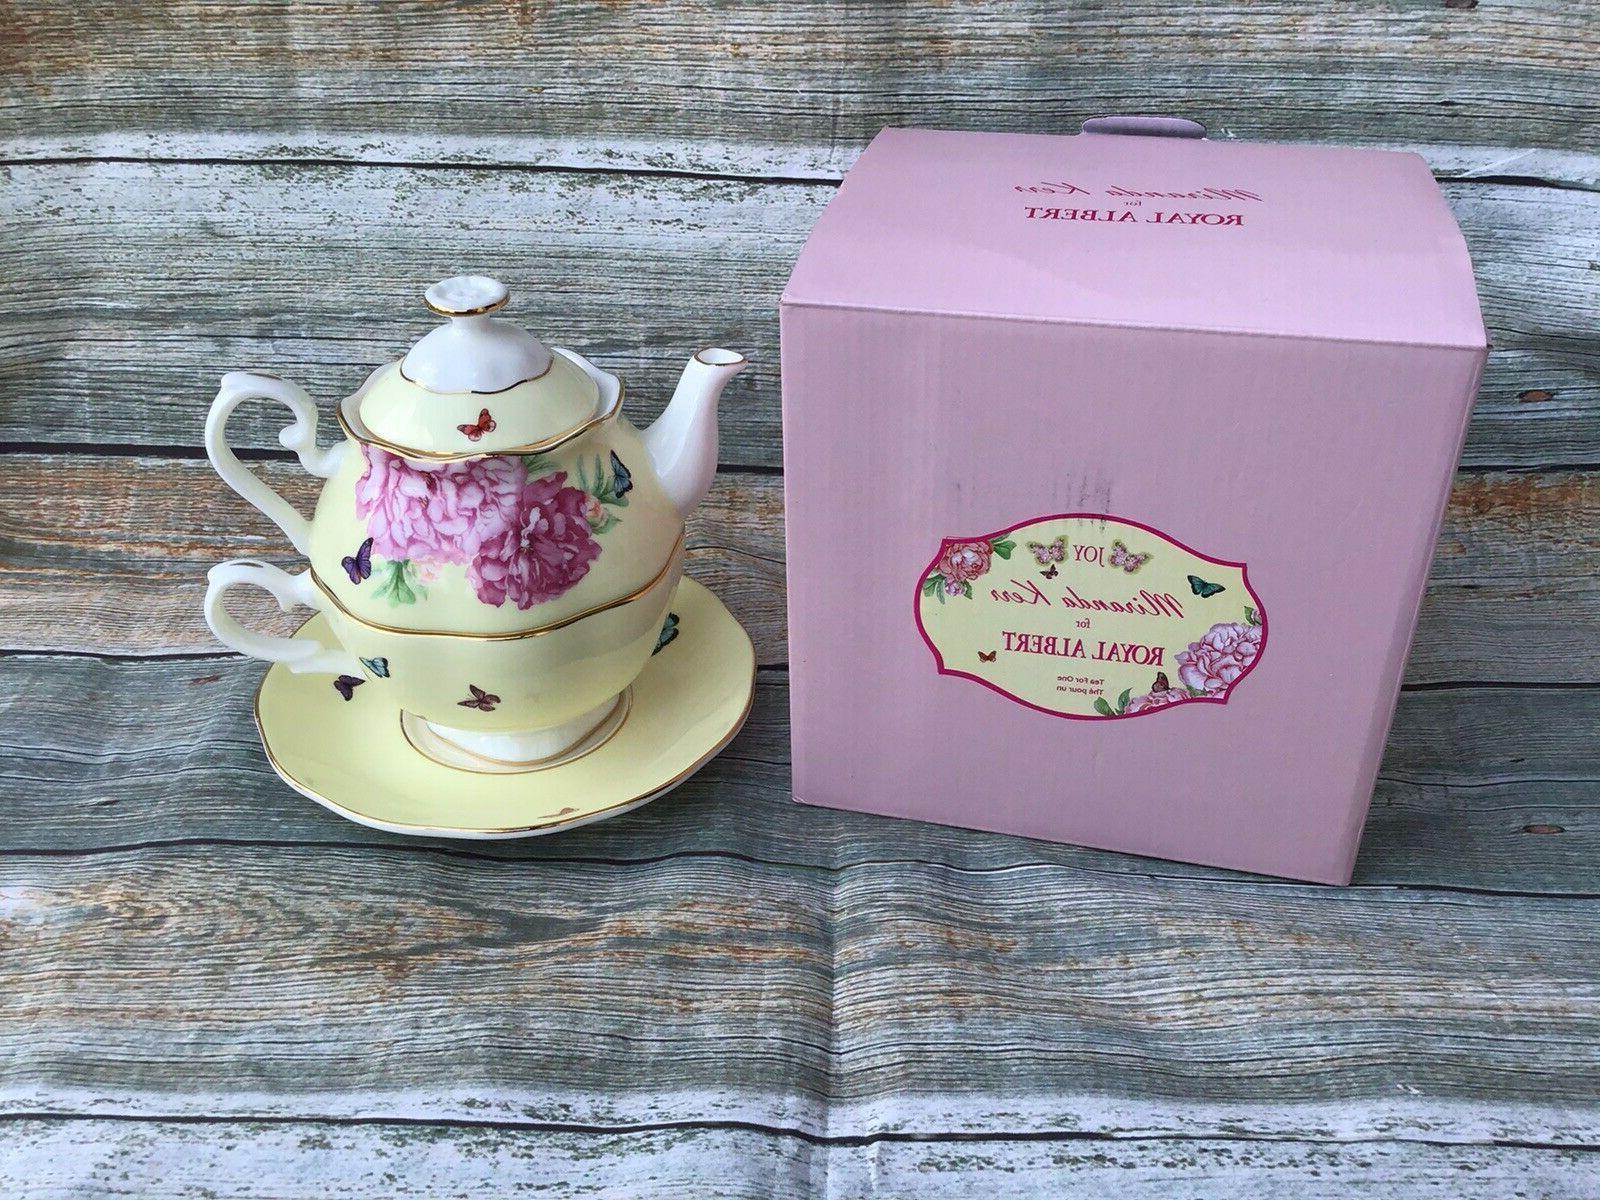 40025888 miranda kerr joy tea for one